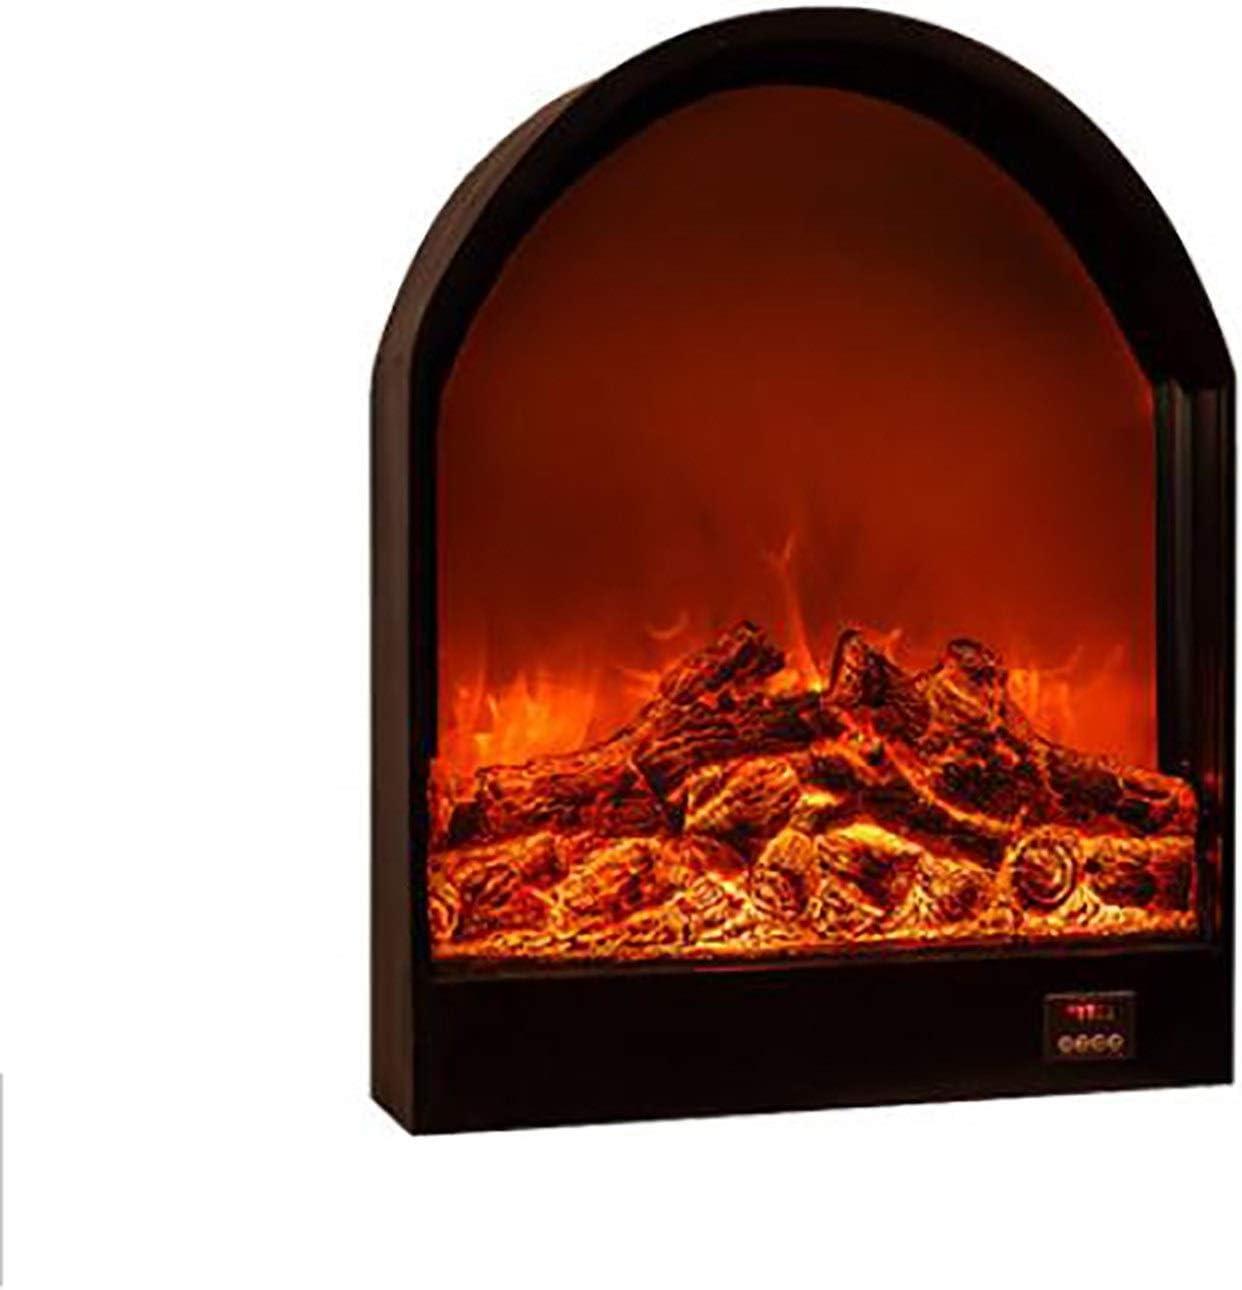 KKLL Fireplace Electric Las Vegas Mall Freestanding S security Heater